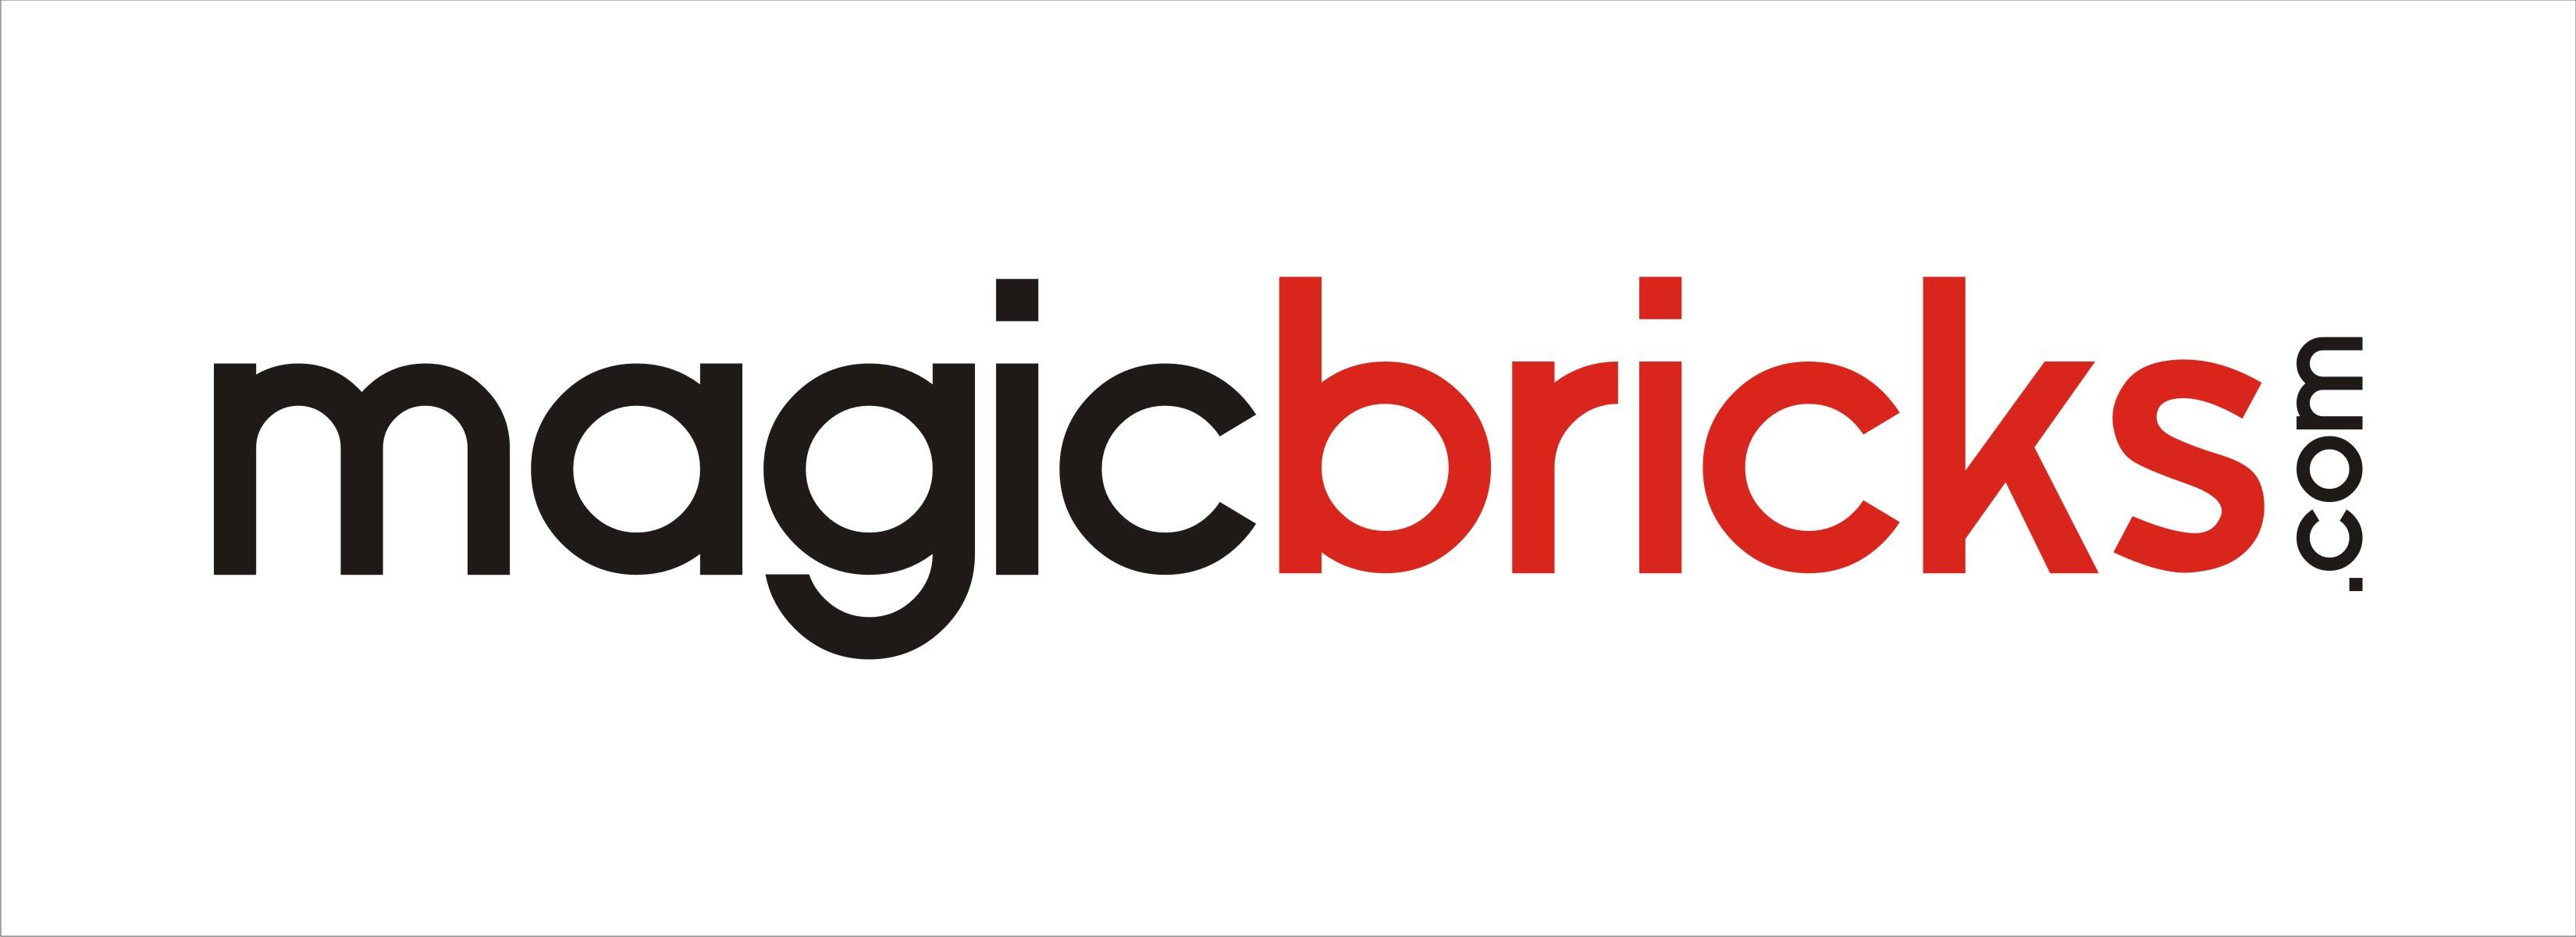 Magicbricks Image